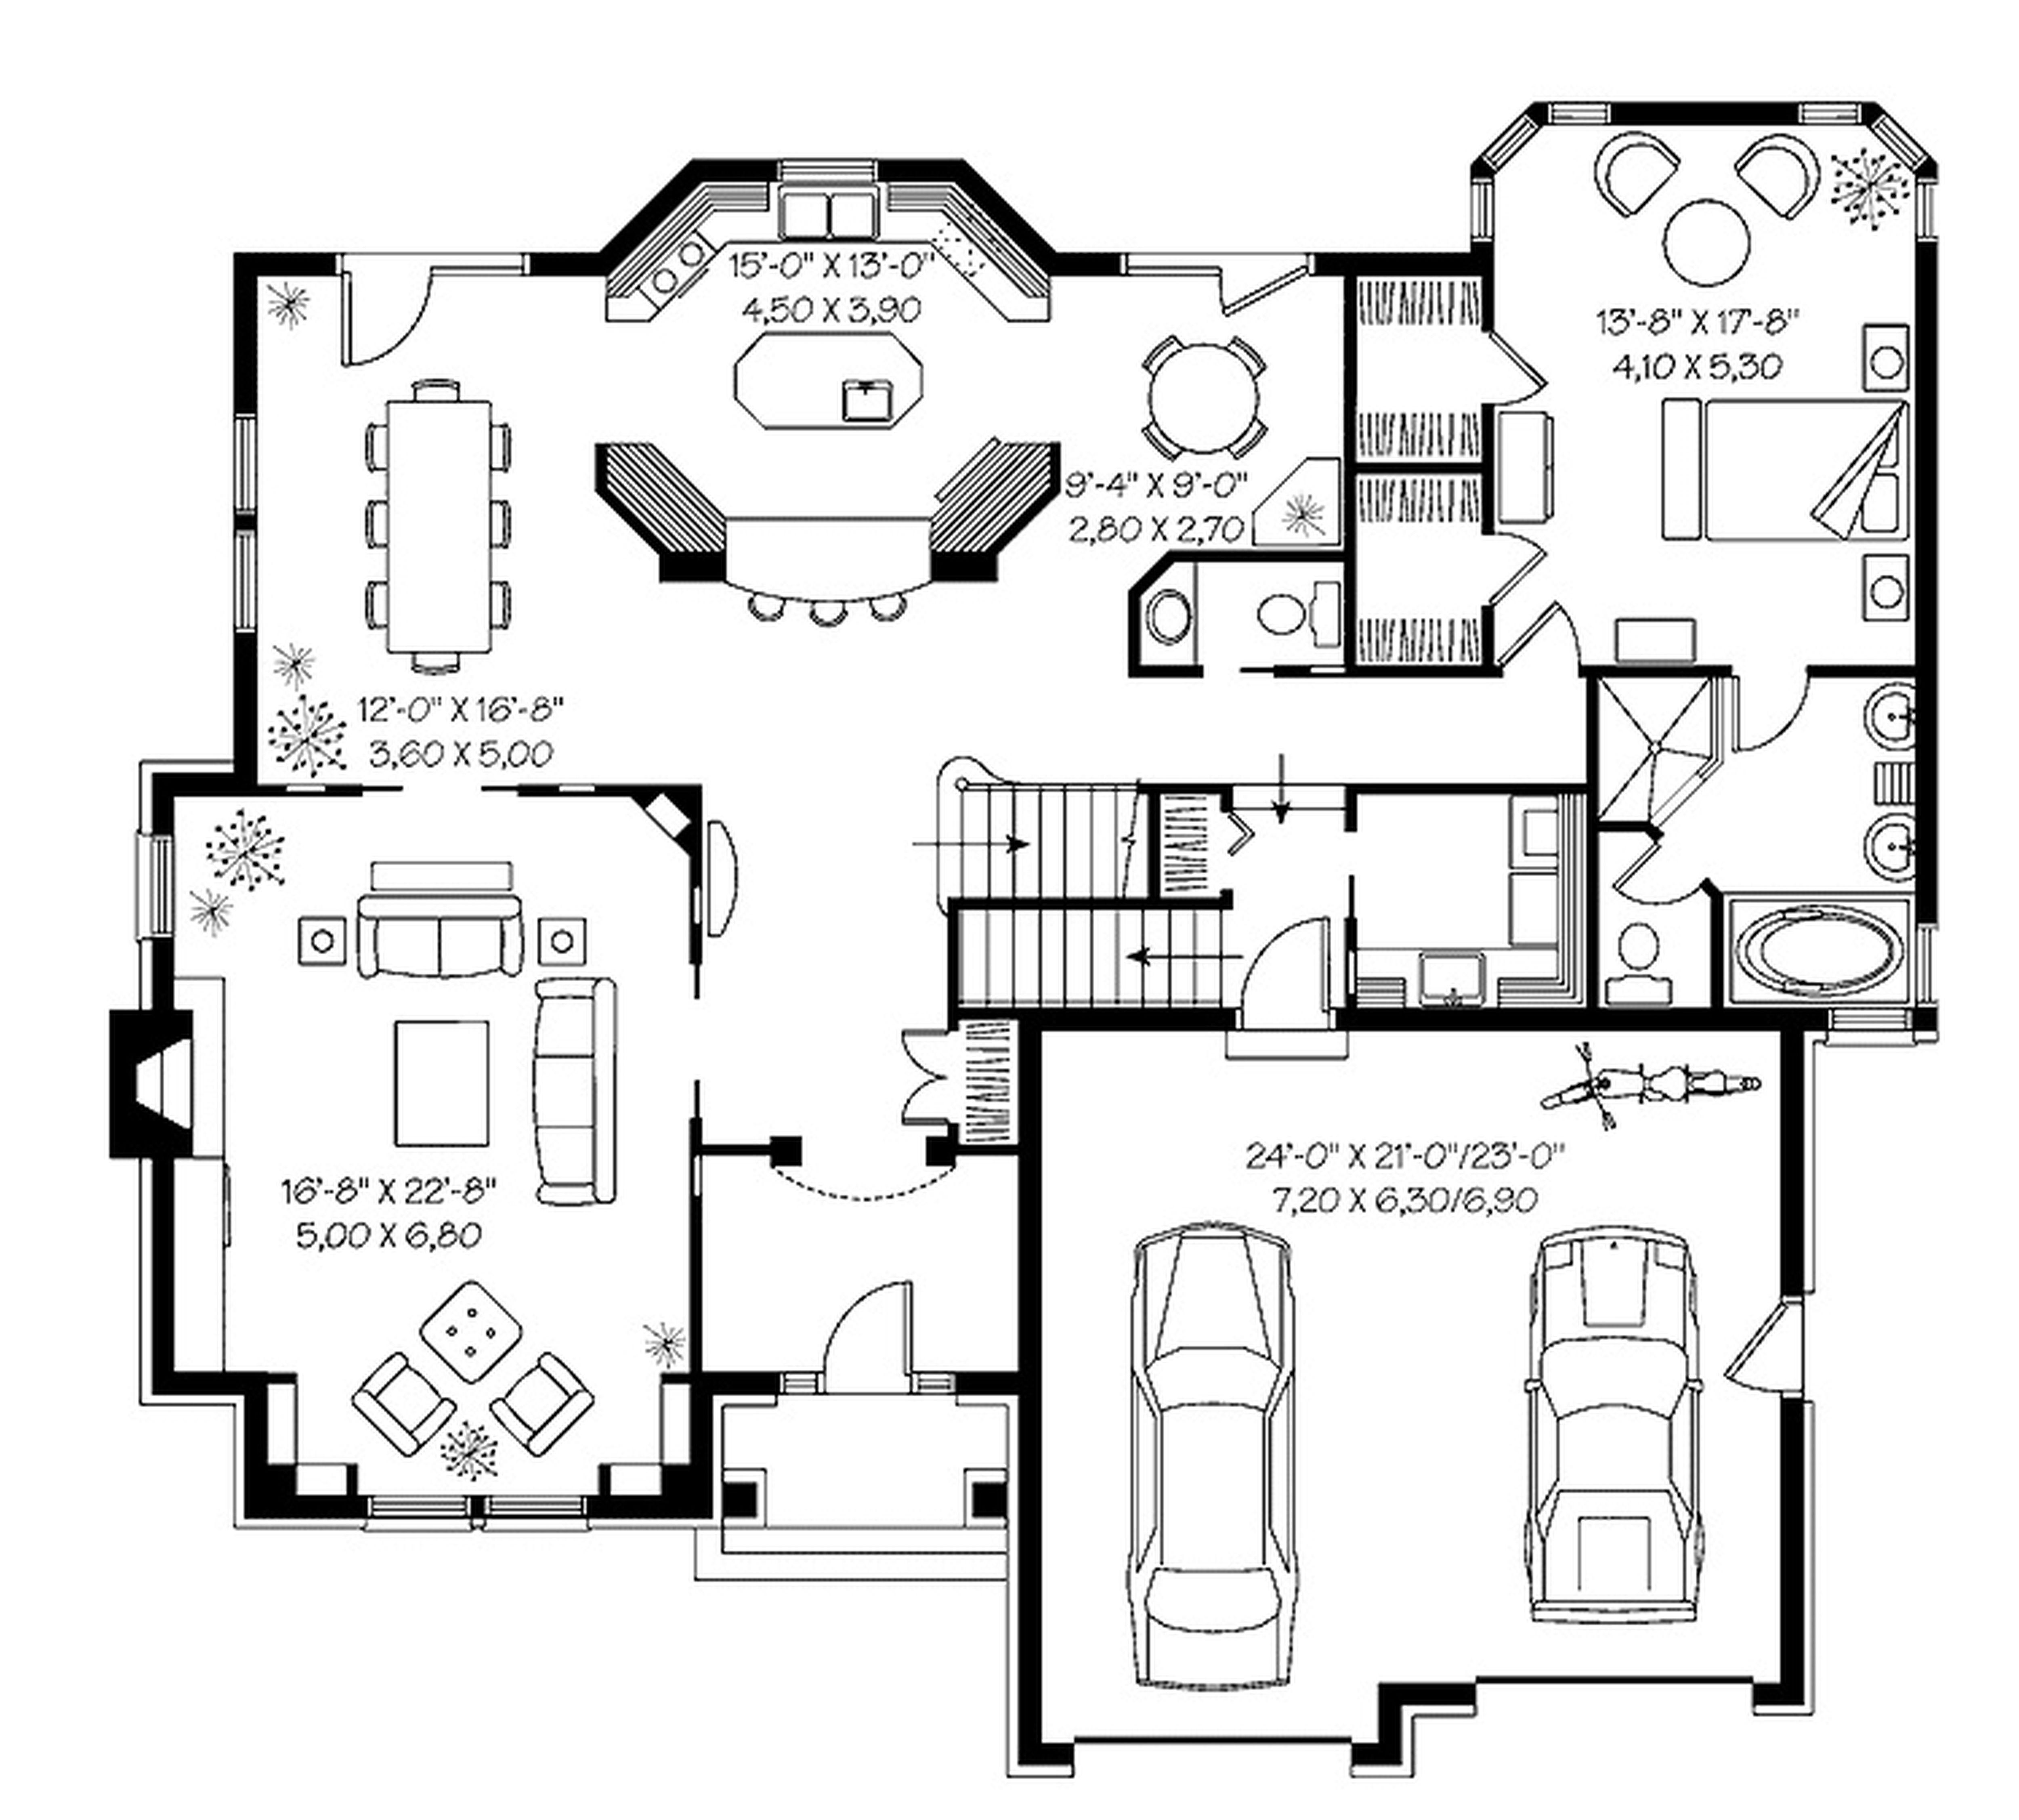 Unusual House Floor Plans House Plans Modern House Floor Plan Unique Black White House Plans